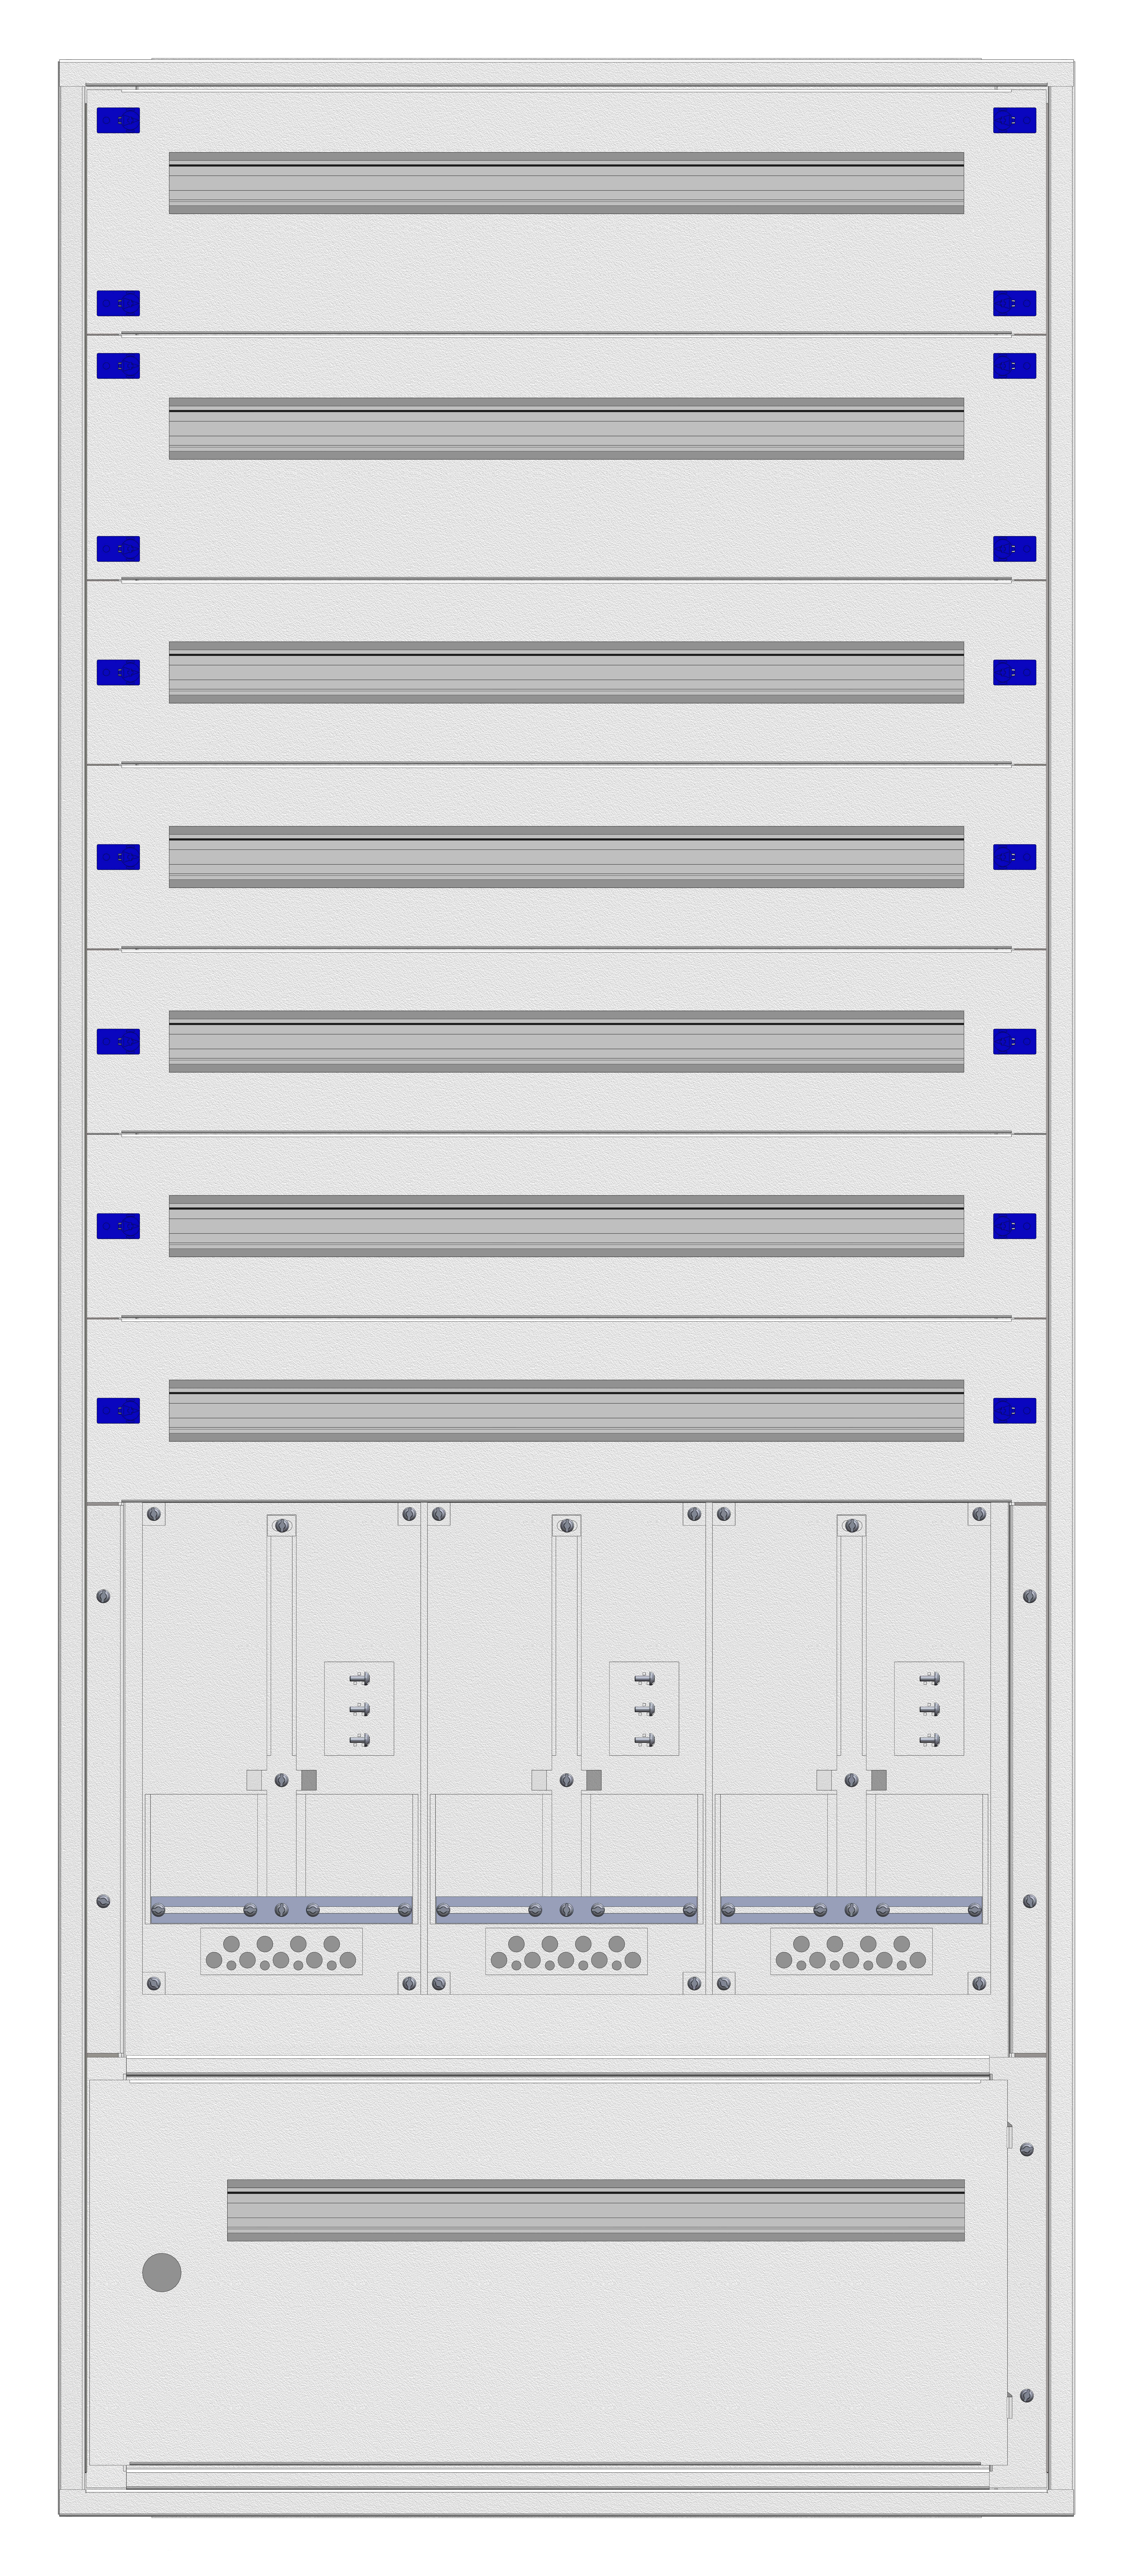 1 Stk Aufputz-Zählerverteiler 3A-39E/STMK 3ZP, H1885B810T250mm IL160339GS